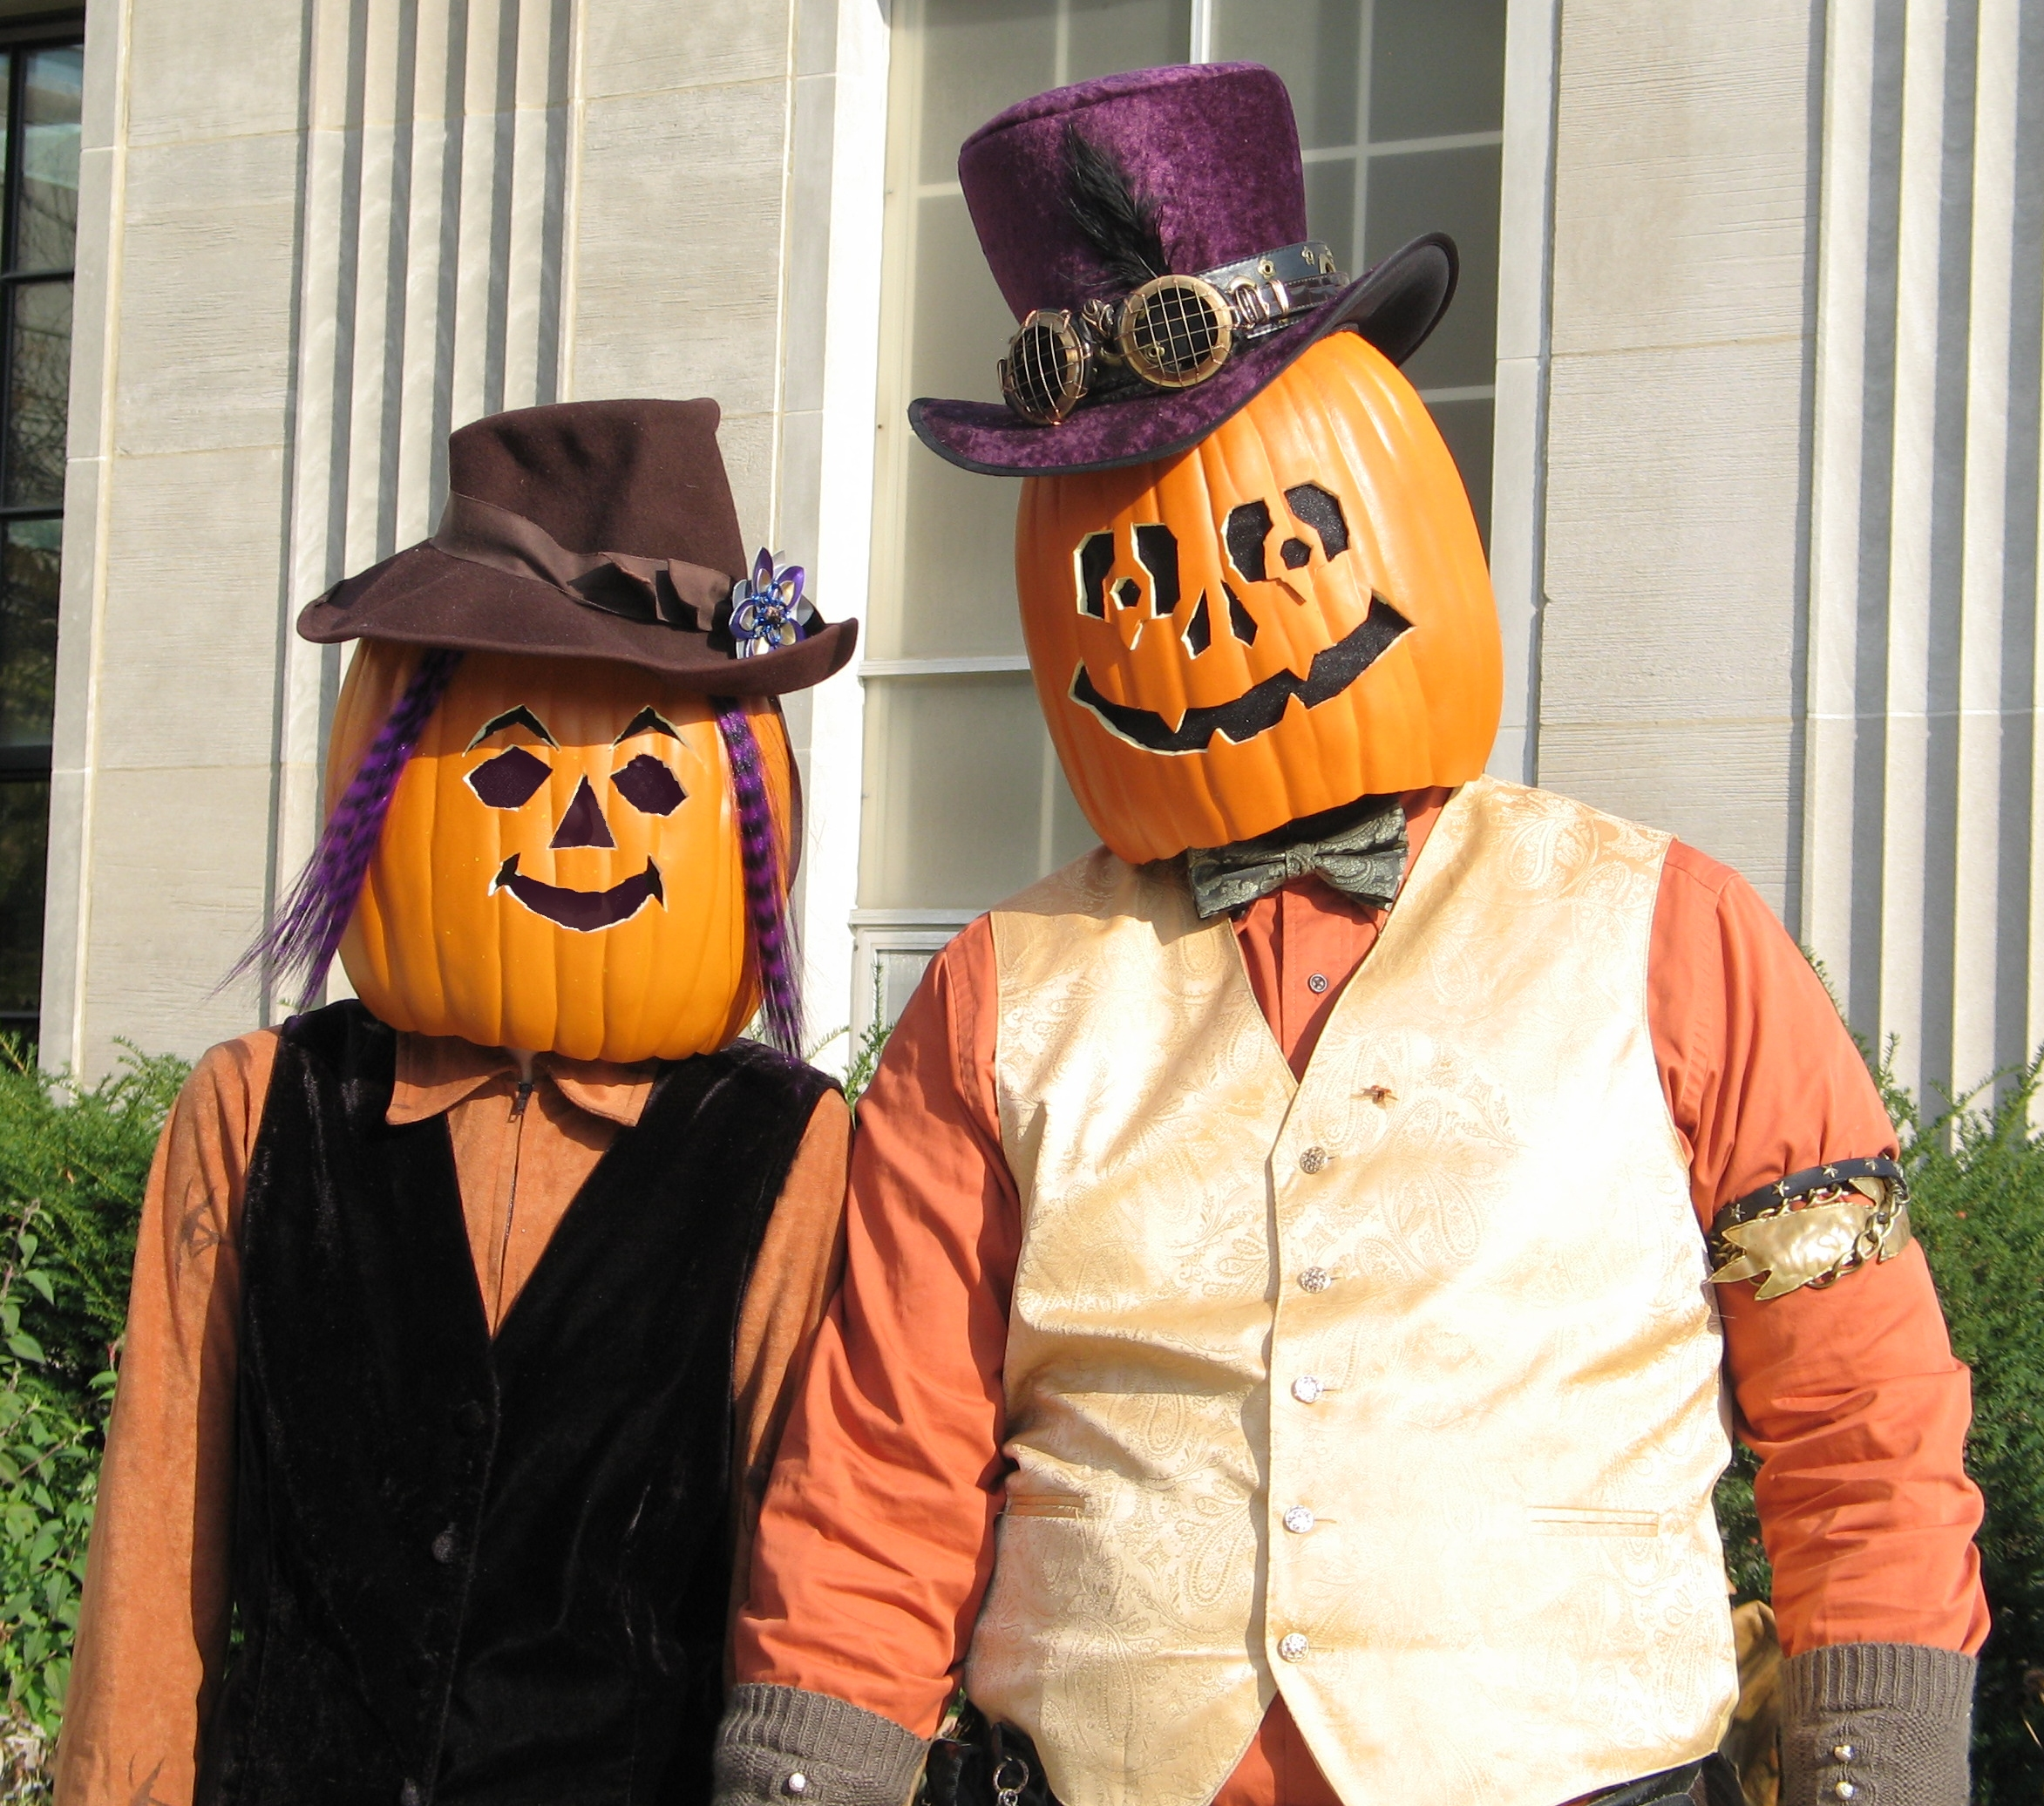 Gourdon and Zuccia Pumpkinhead 7 by Windthin